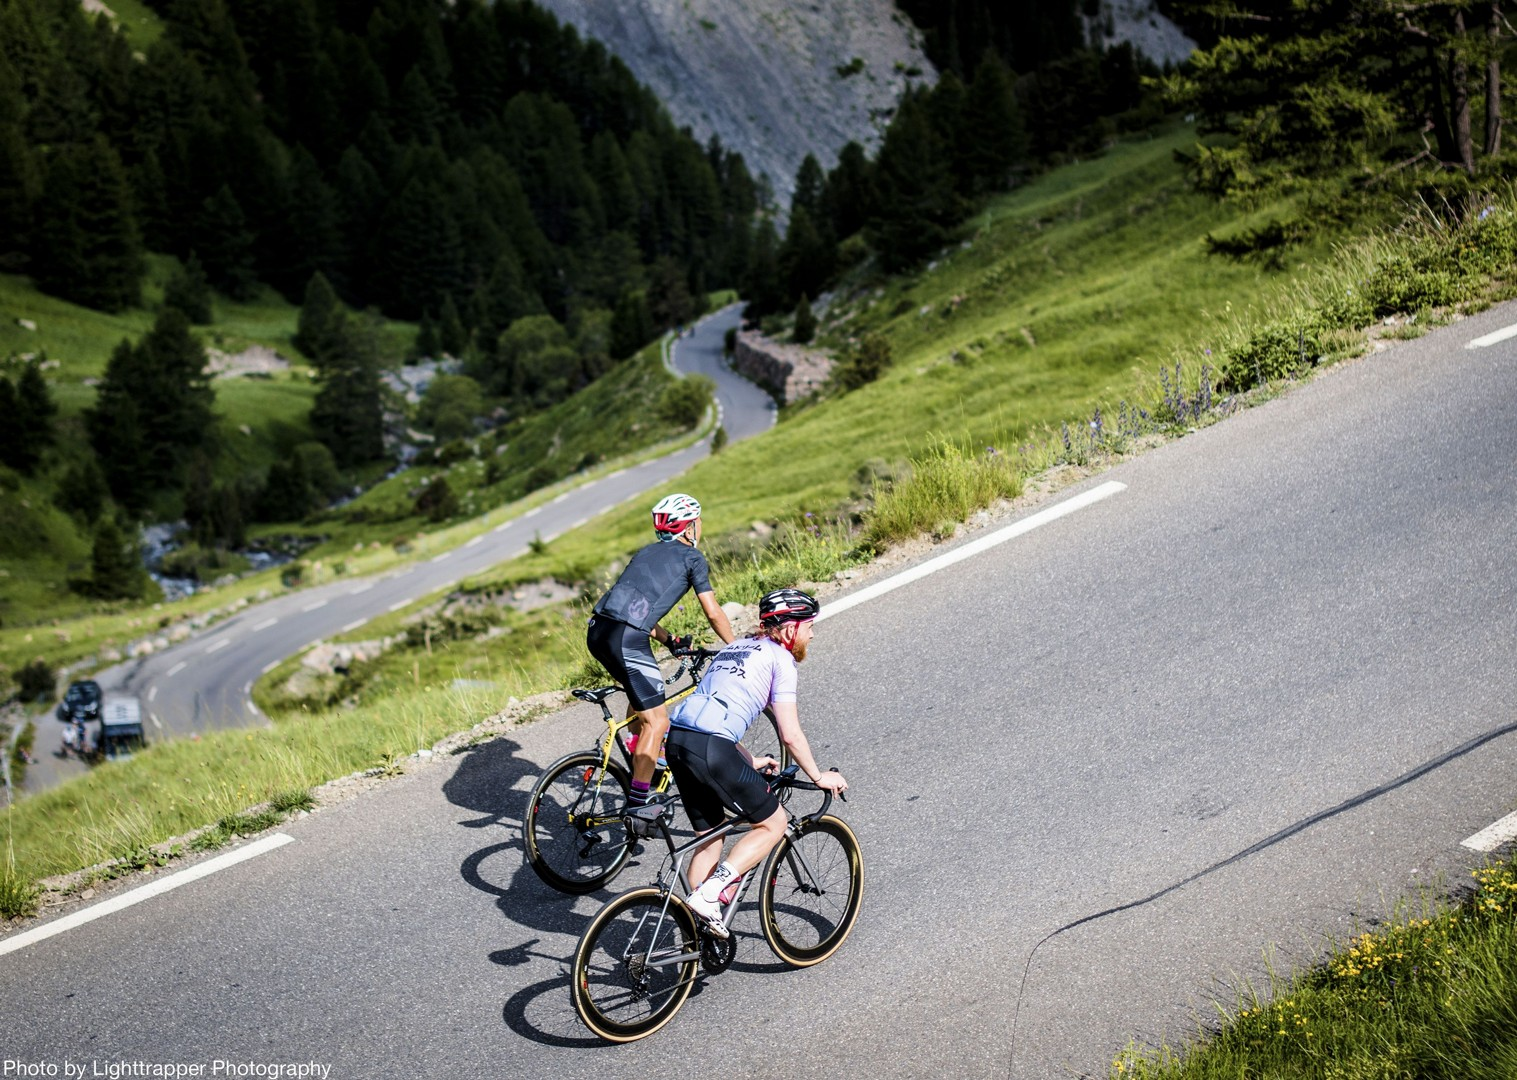 high-ascent-climbs-france-raid-alpine-road-cycling-holiday.jpg - France - Raid Alpine - Guided Road Cycling Holiday - Road Cycling